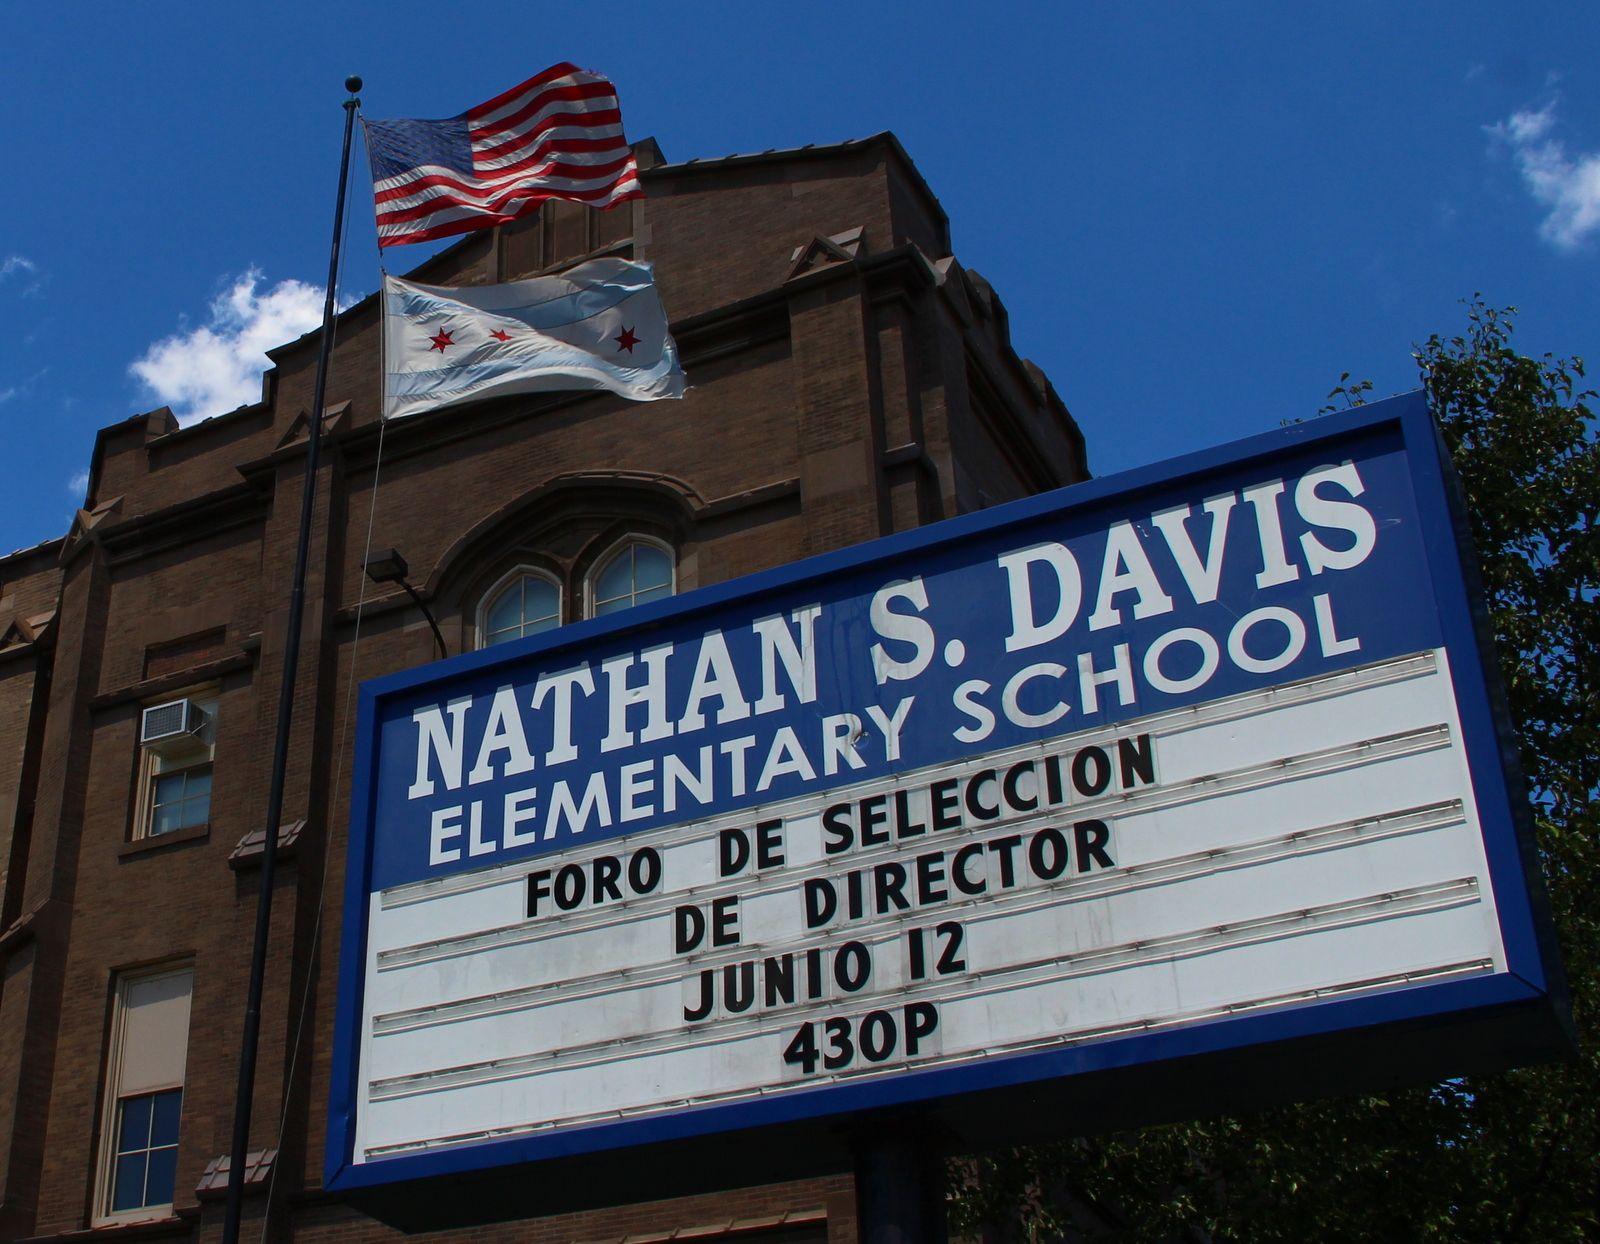 featured image Nathan S. Davis Elementary School